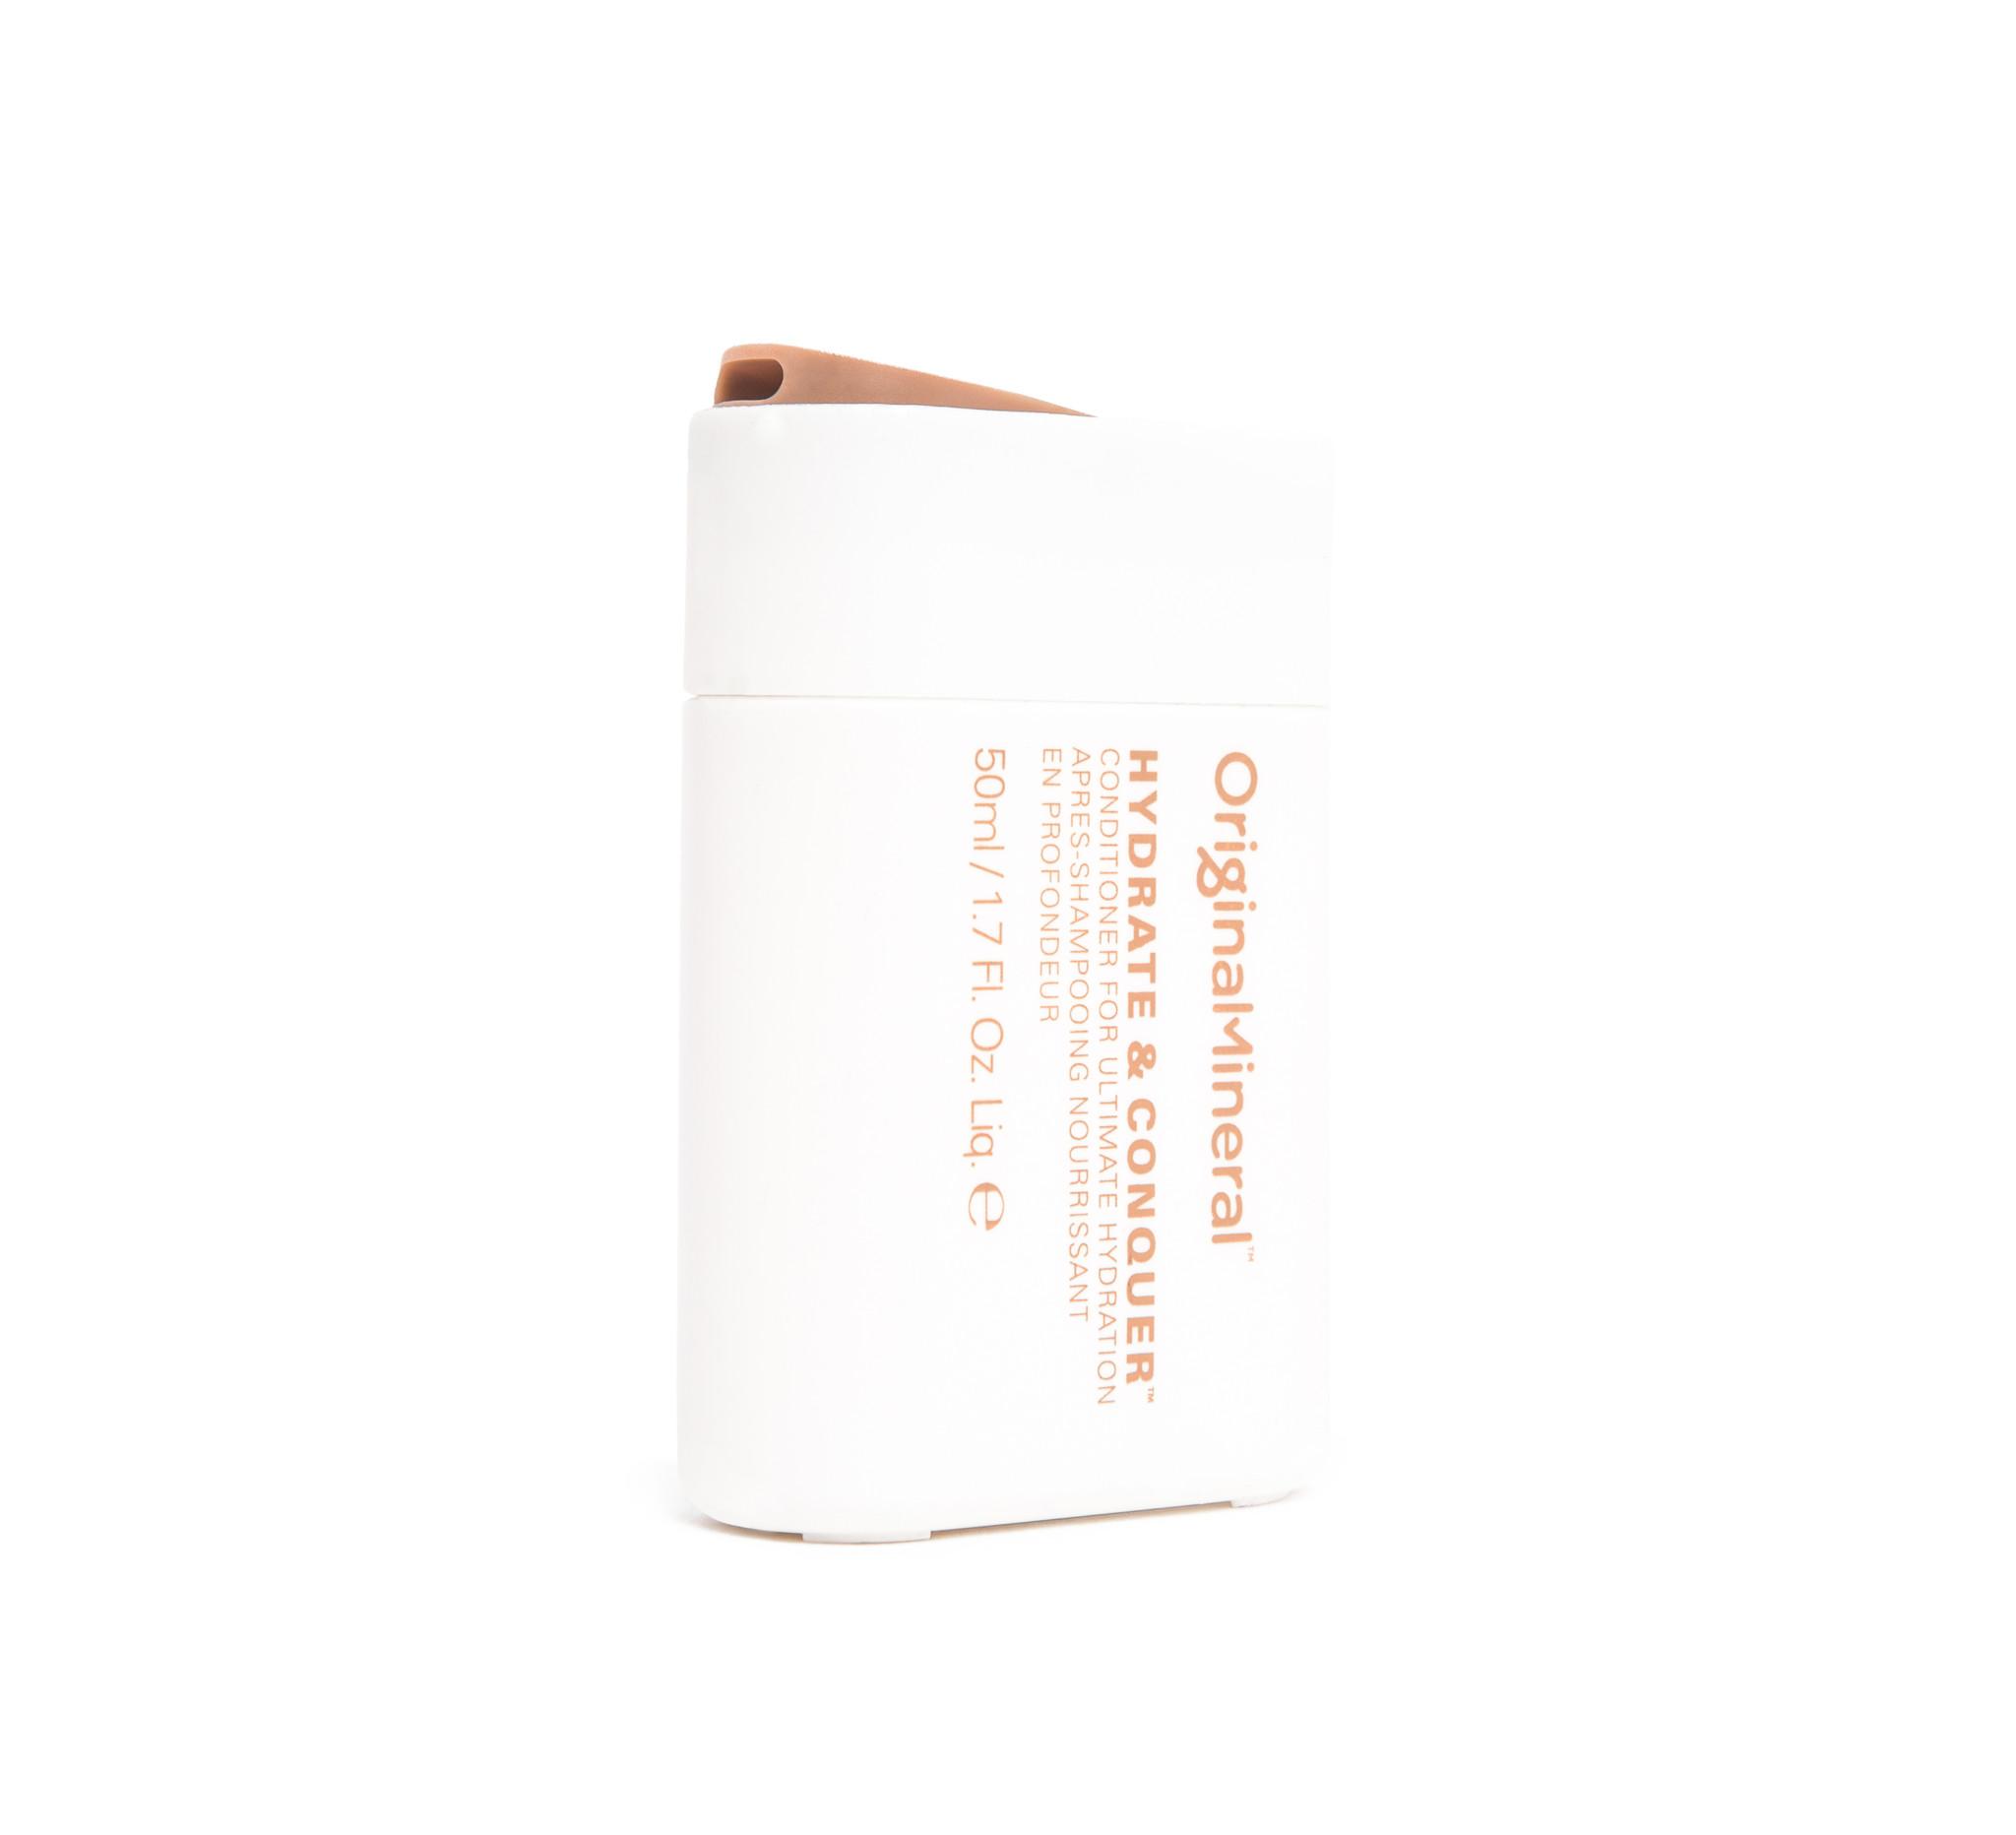 O&M - Original Mineral O&M Hydrate & Conquer Revitalisant Nourissant en profondeur - 50ml